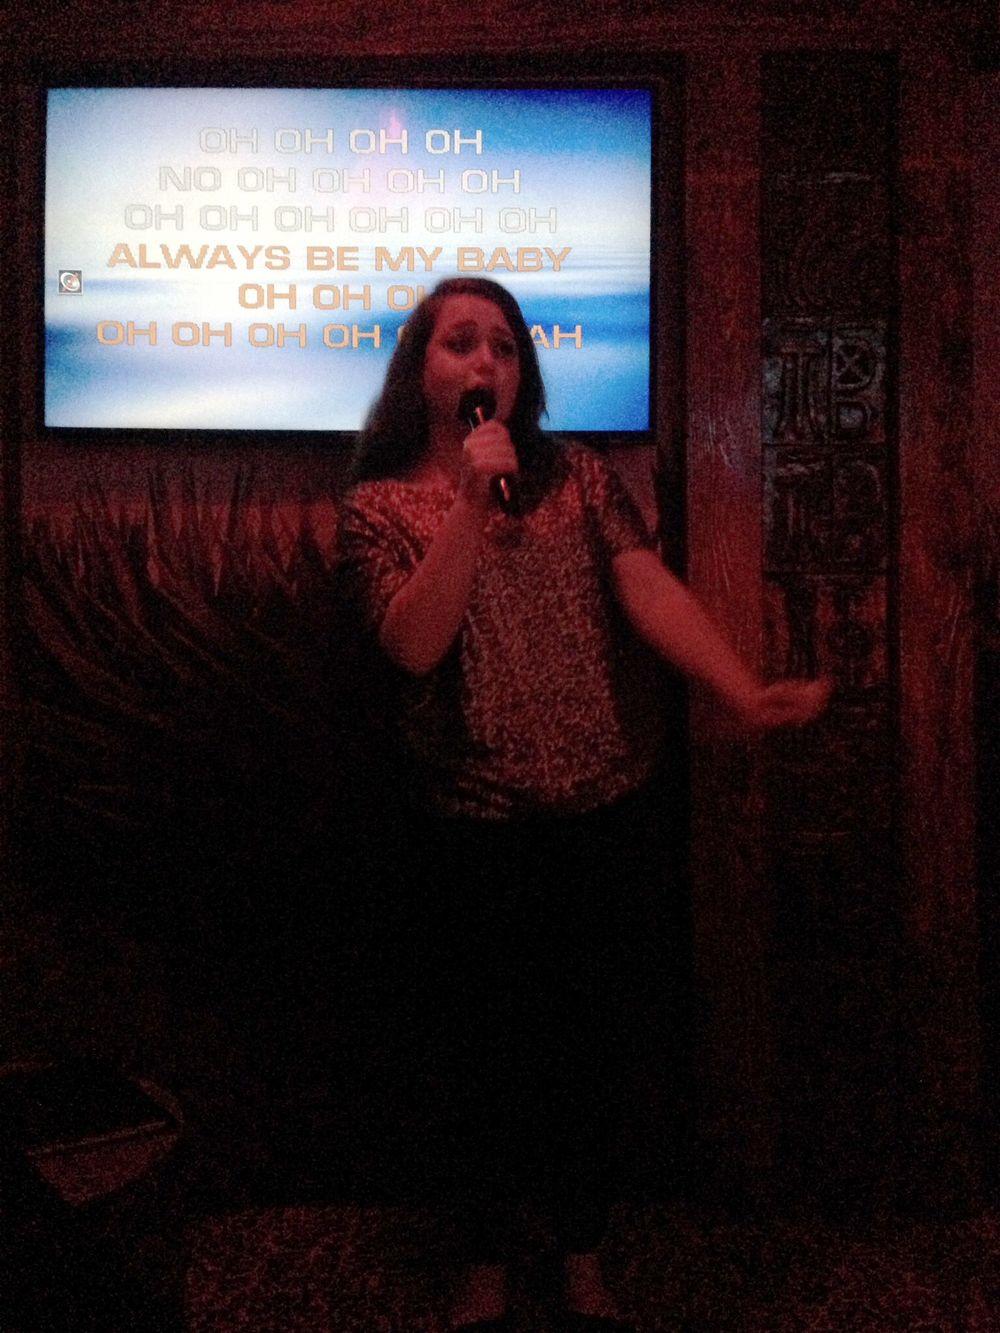 Karaoke at Blind Dragon | cremelifestyle.com